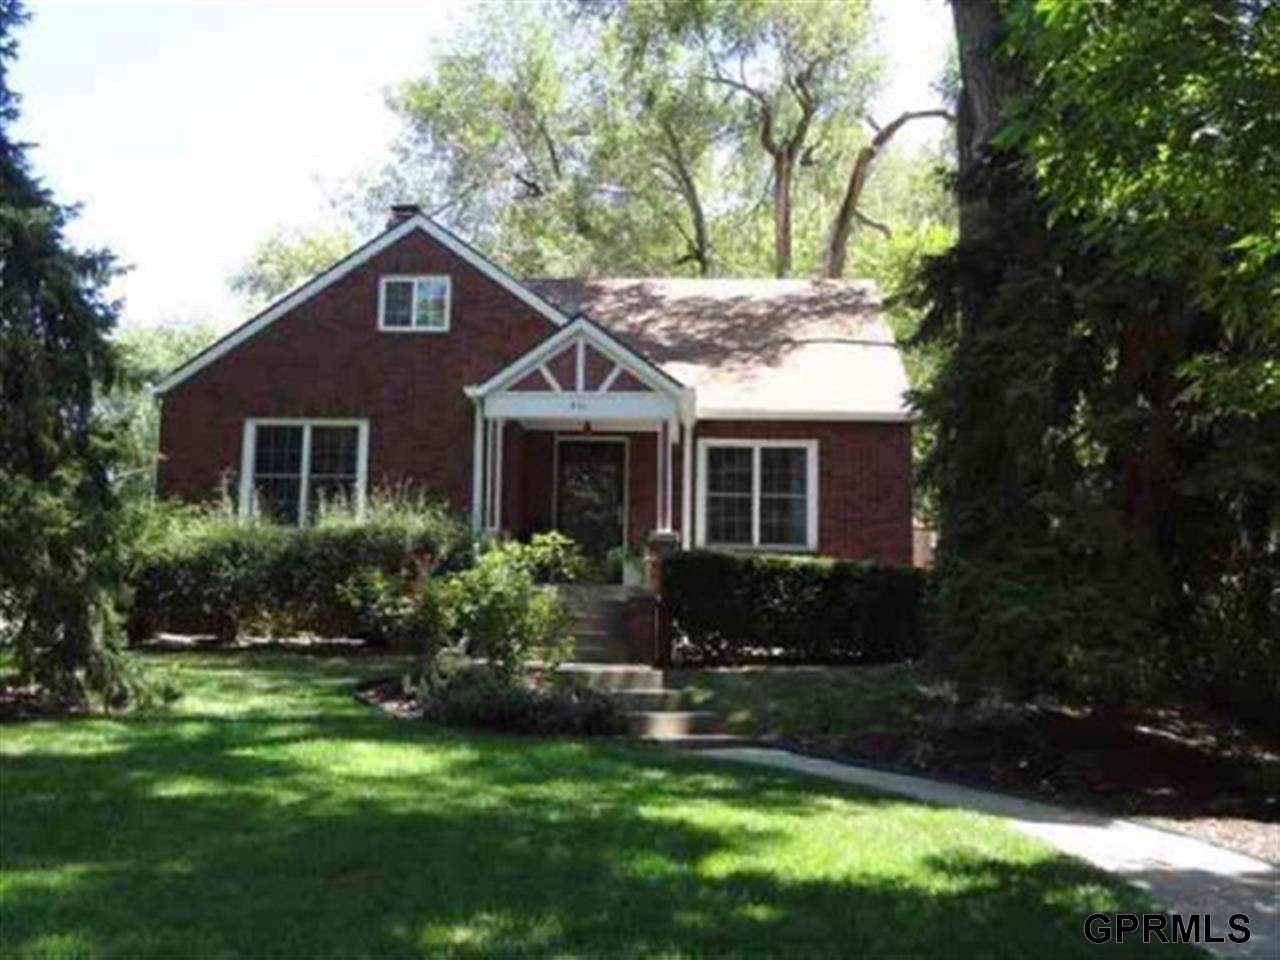 Rental Homes for Rent, ListingId:30231543, location: 801 S 68th Street Omaha 68106